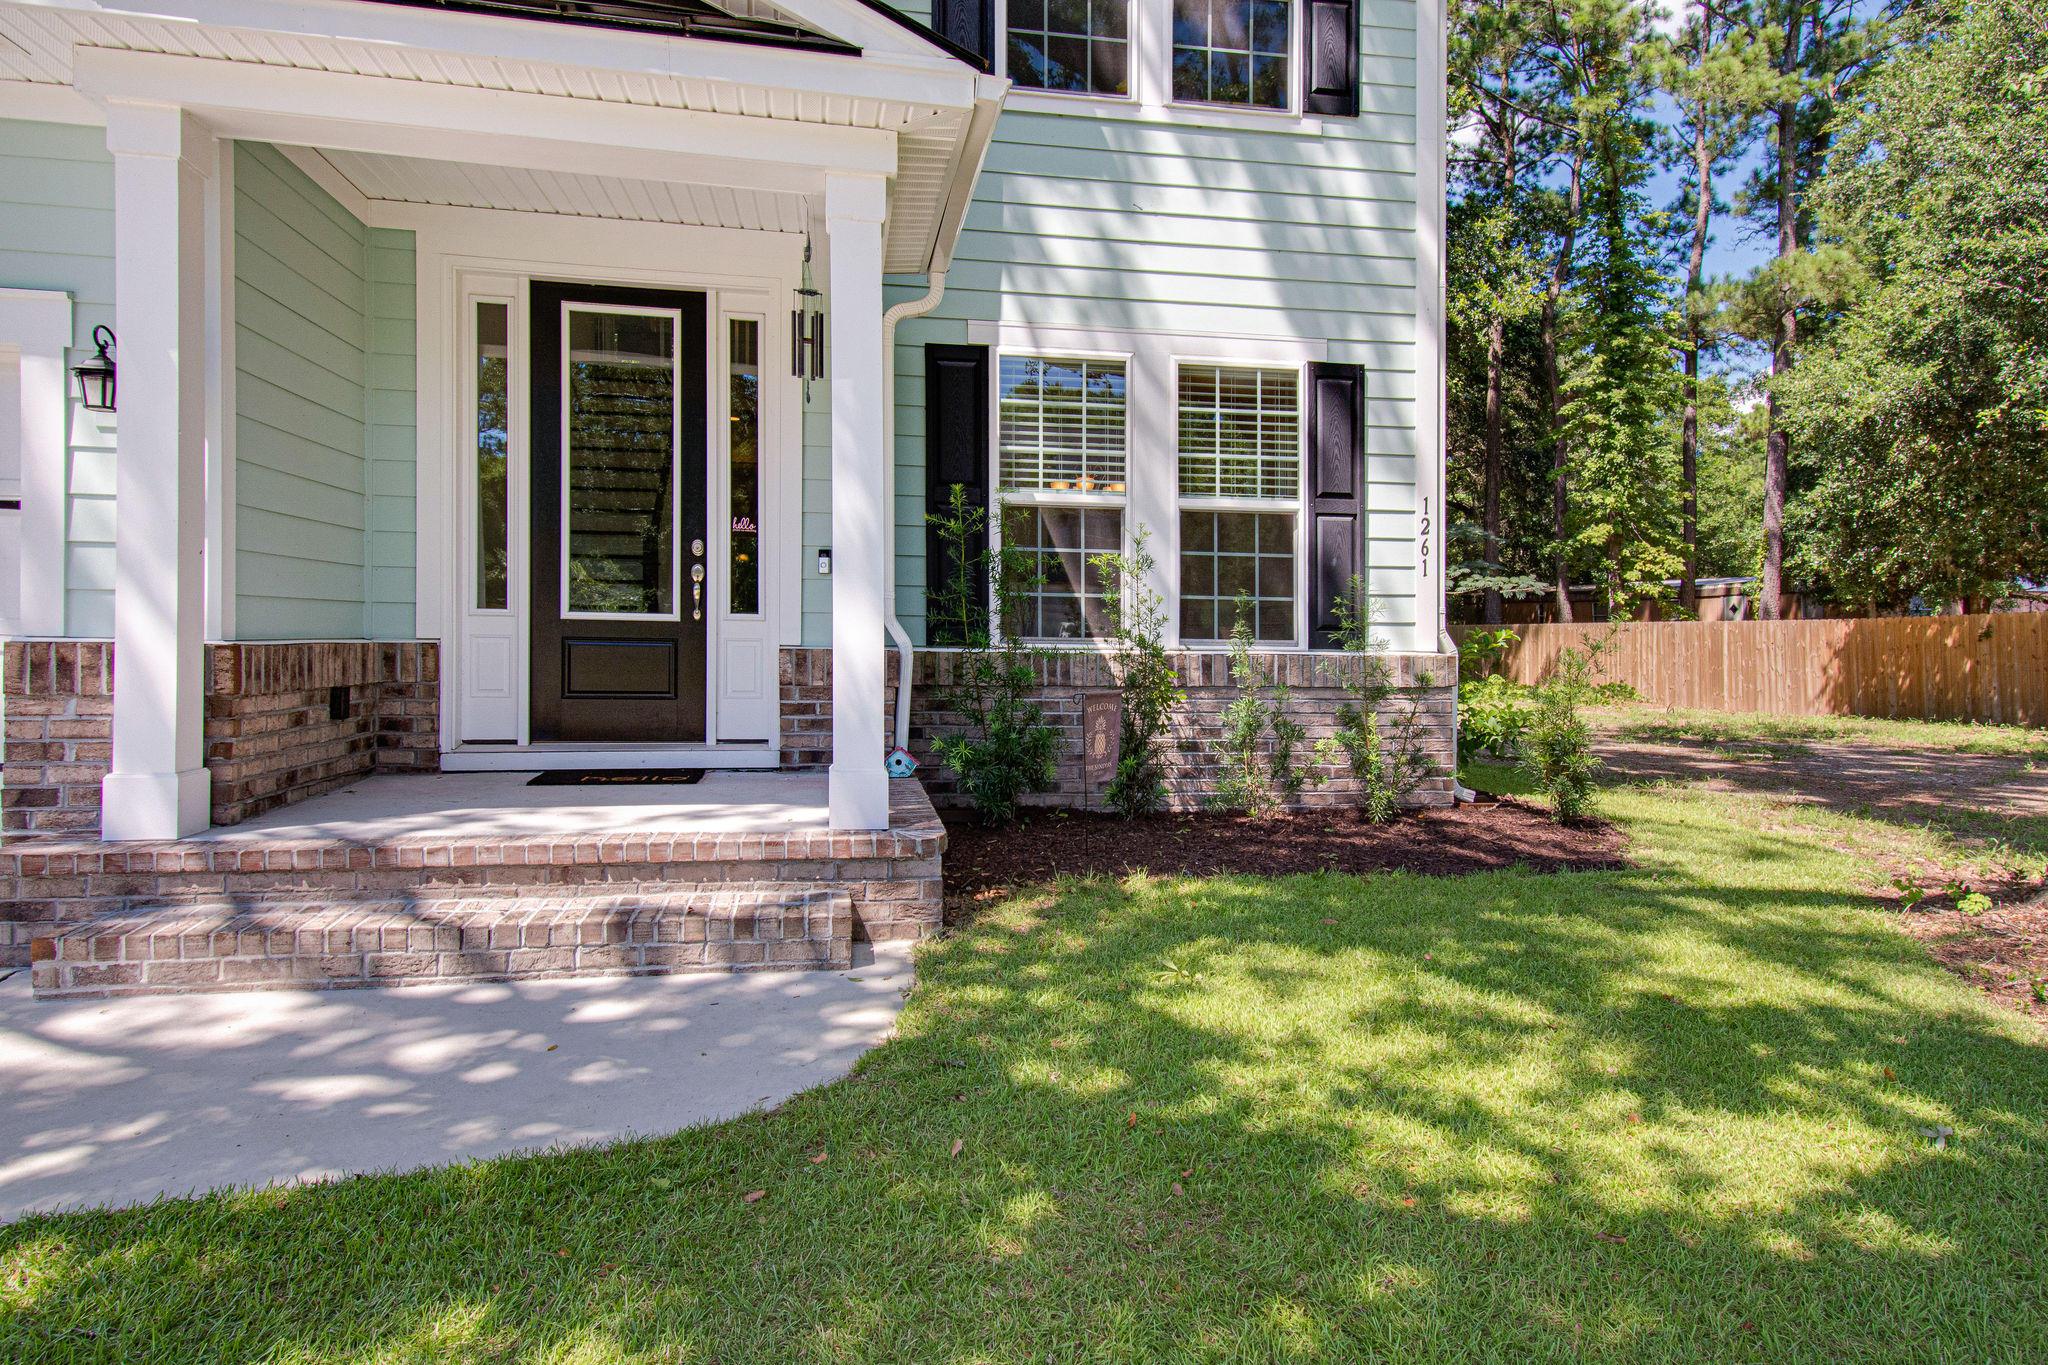 Magnolia Village Homes For Sale - 1261 Pearwood, Mount Pleasant, SC - 1